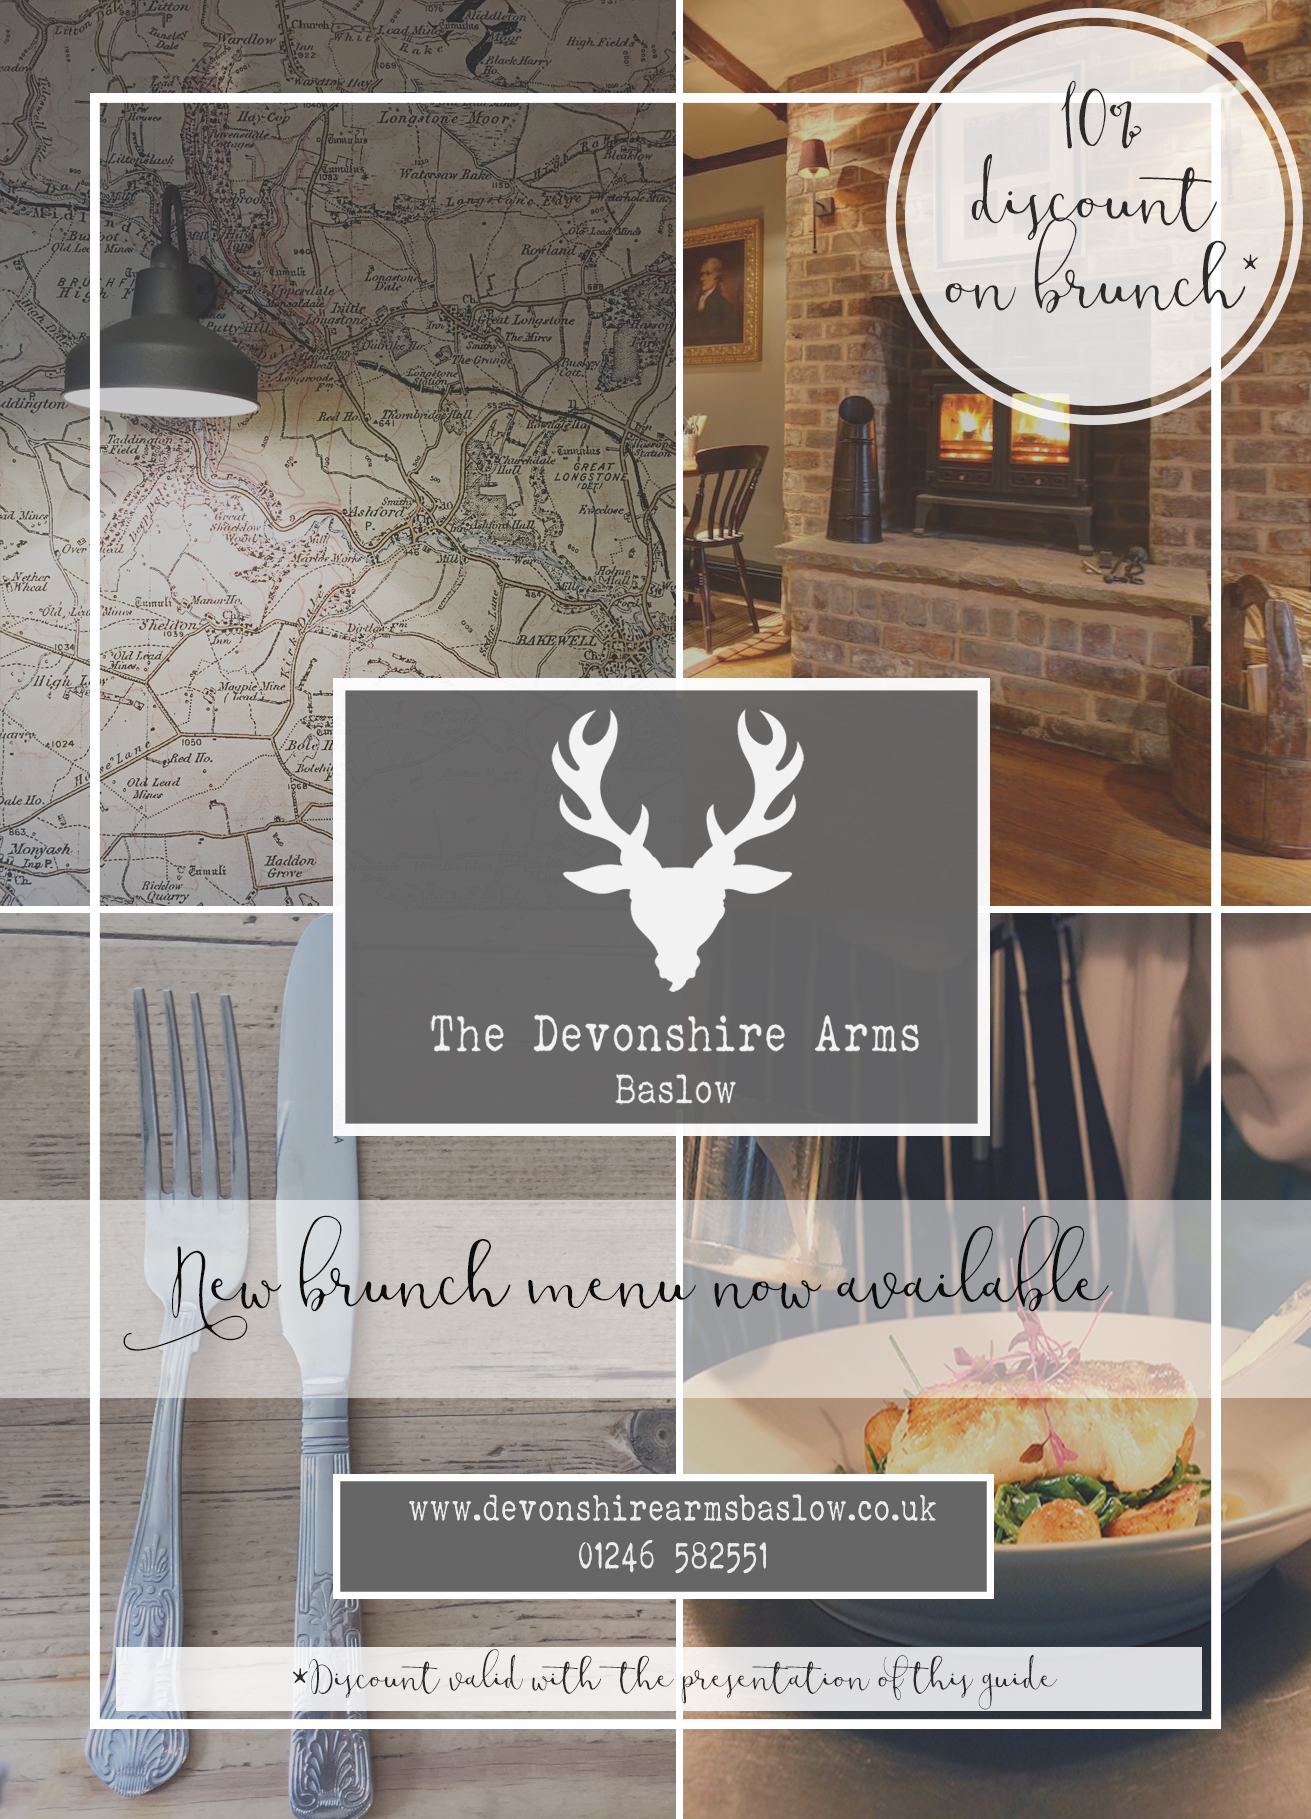 Small business advert design Derbyshire